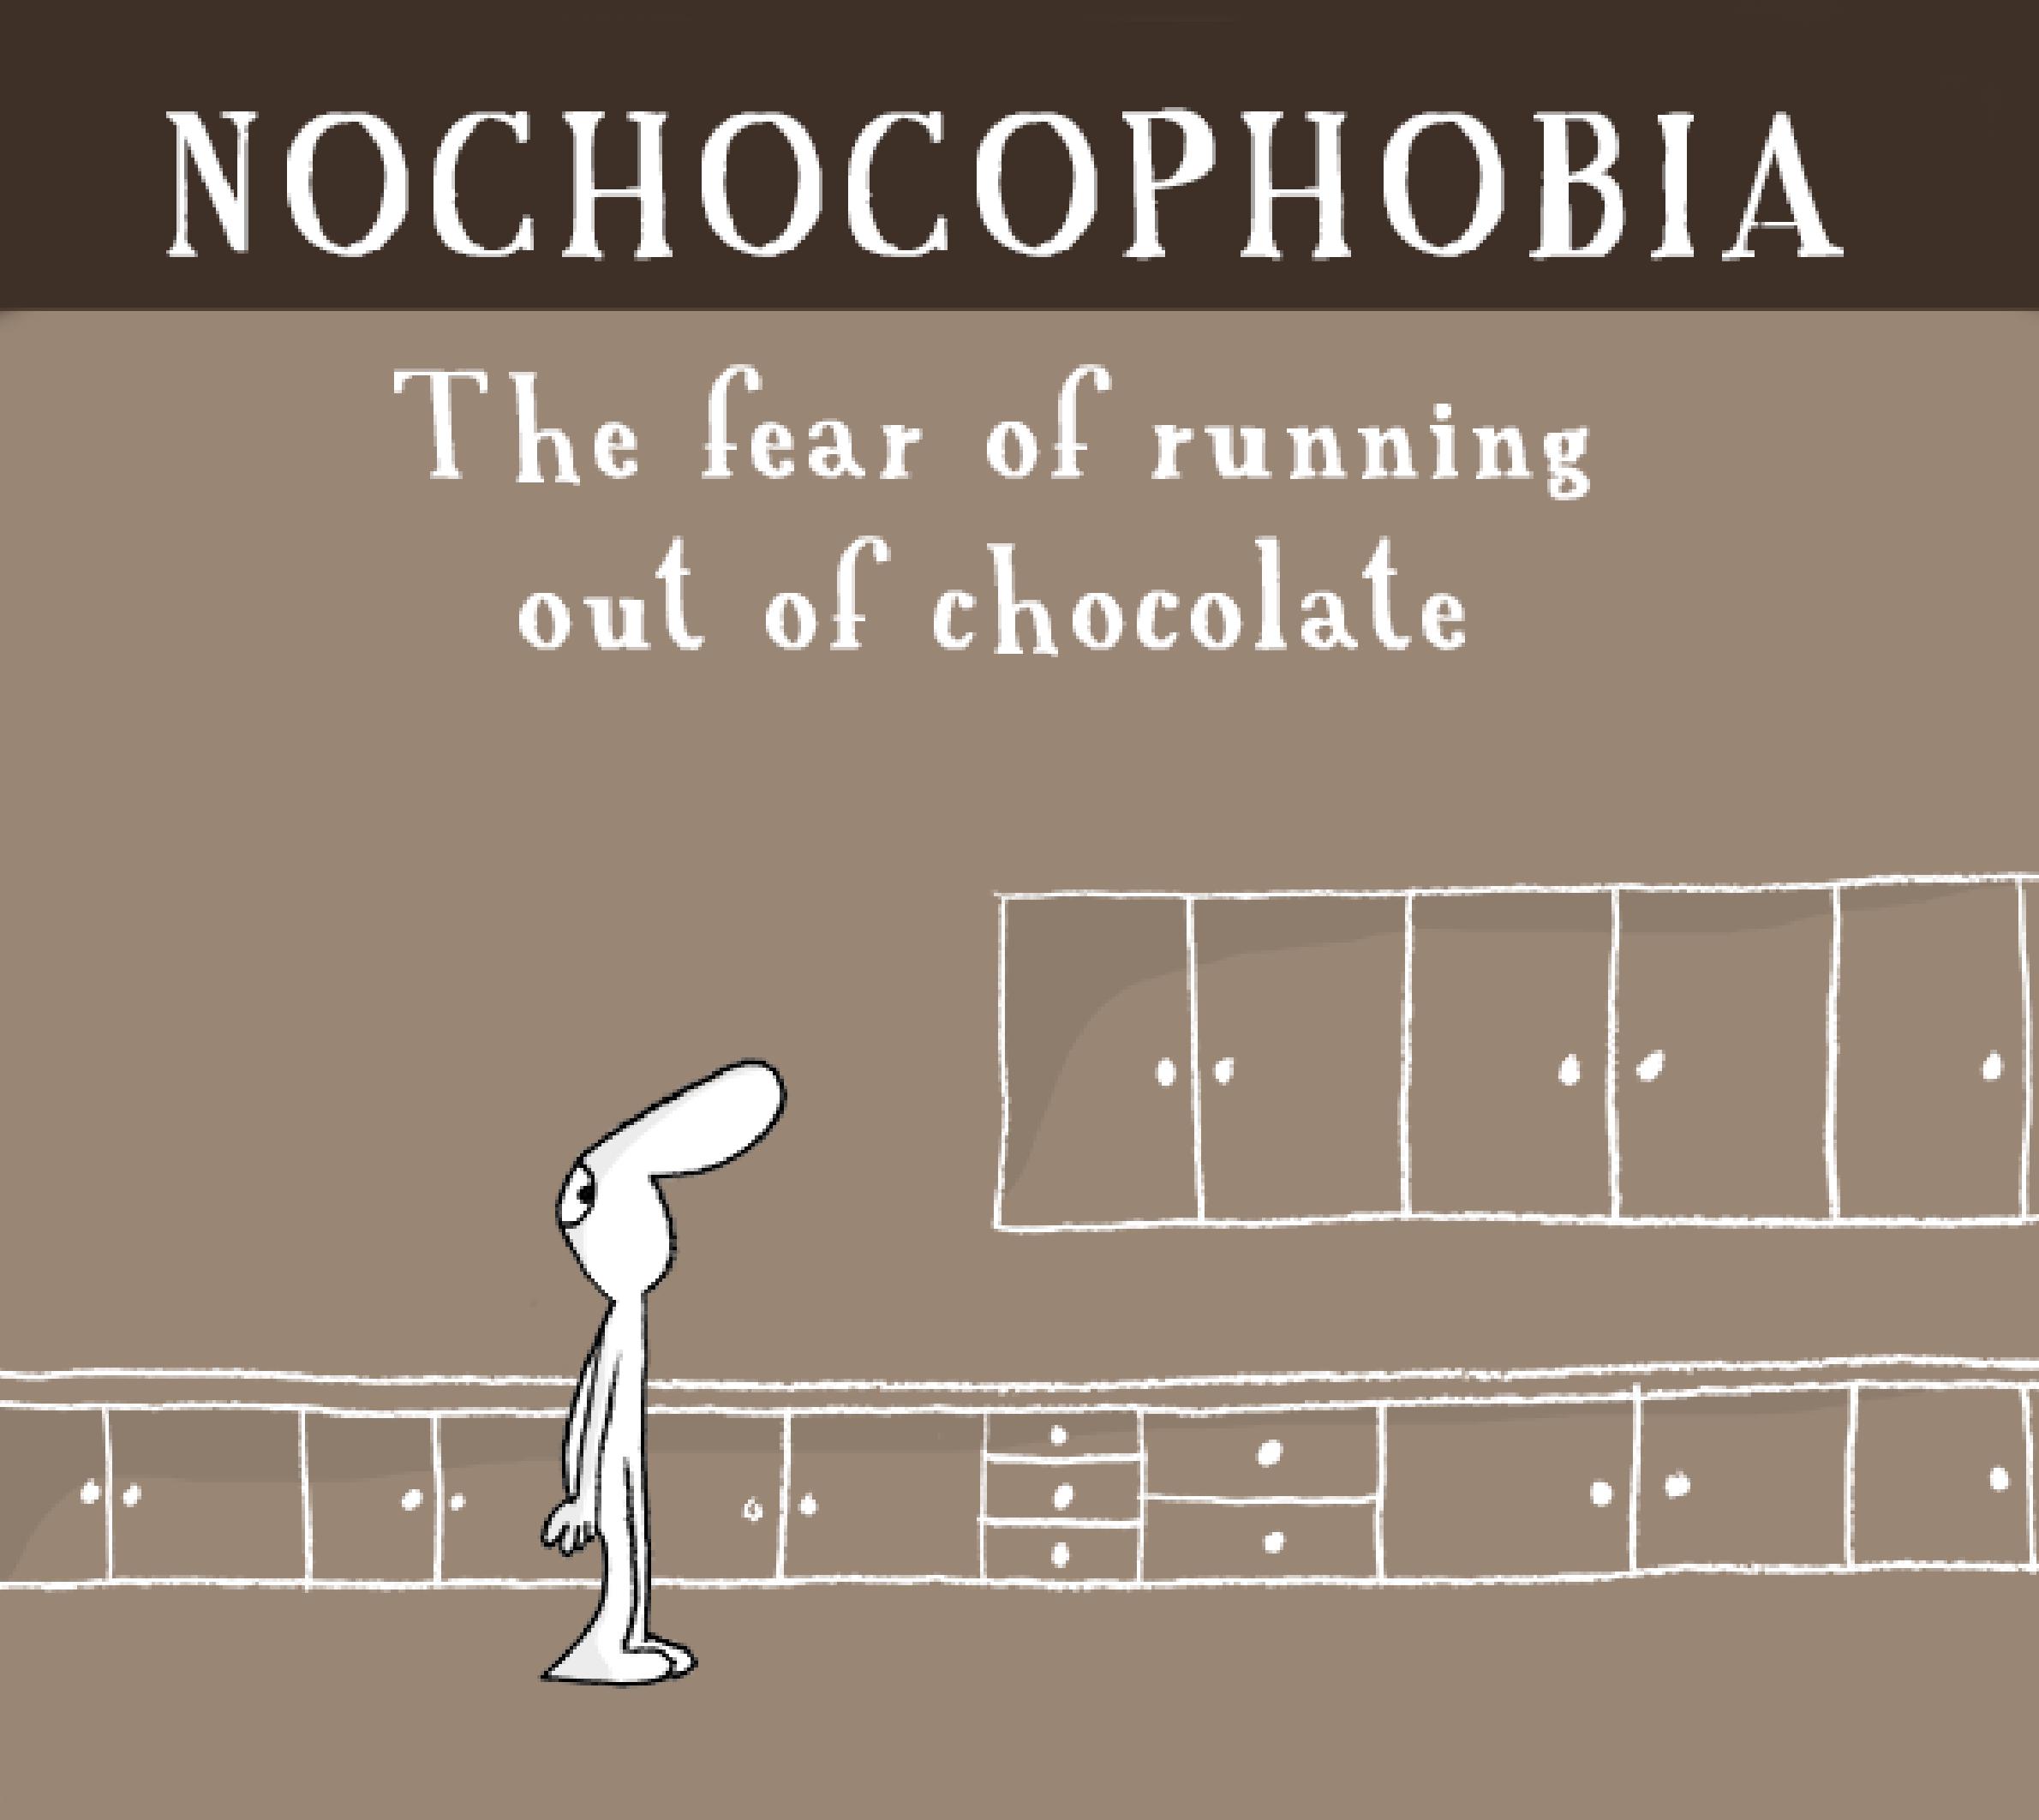 Nochocophobia Chocolate Quotes Chocolate Humor Chocolate Lovers Quotes